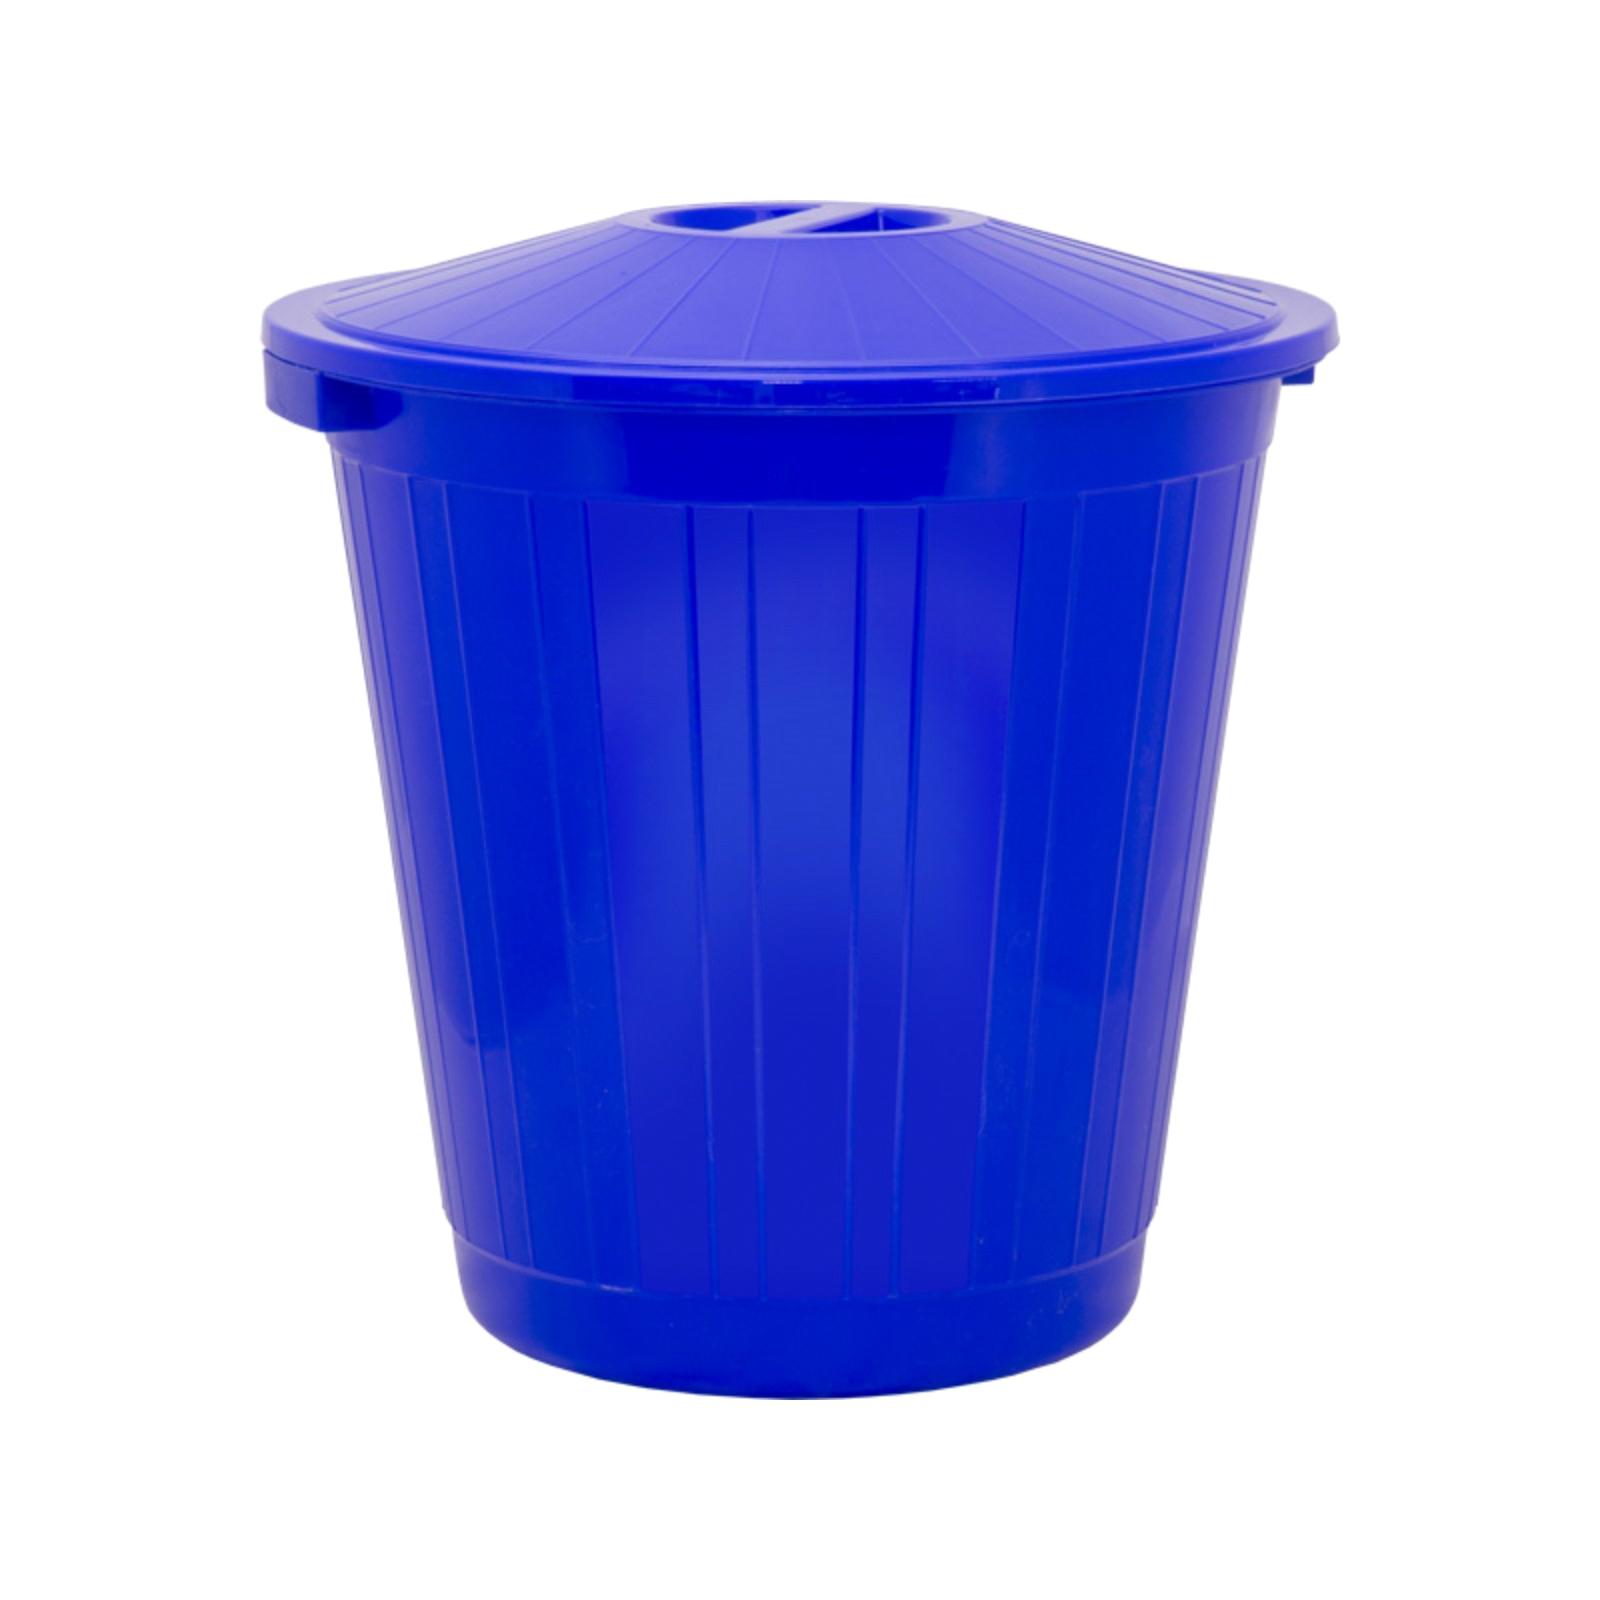 Фото - Мусорный бак Элластик-пласт пластиковый с крышкой 70 л синий бак пласт квадратный с крышкой 300 л 1 3 альтернатива м3047